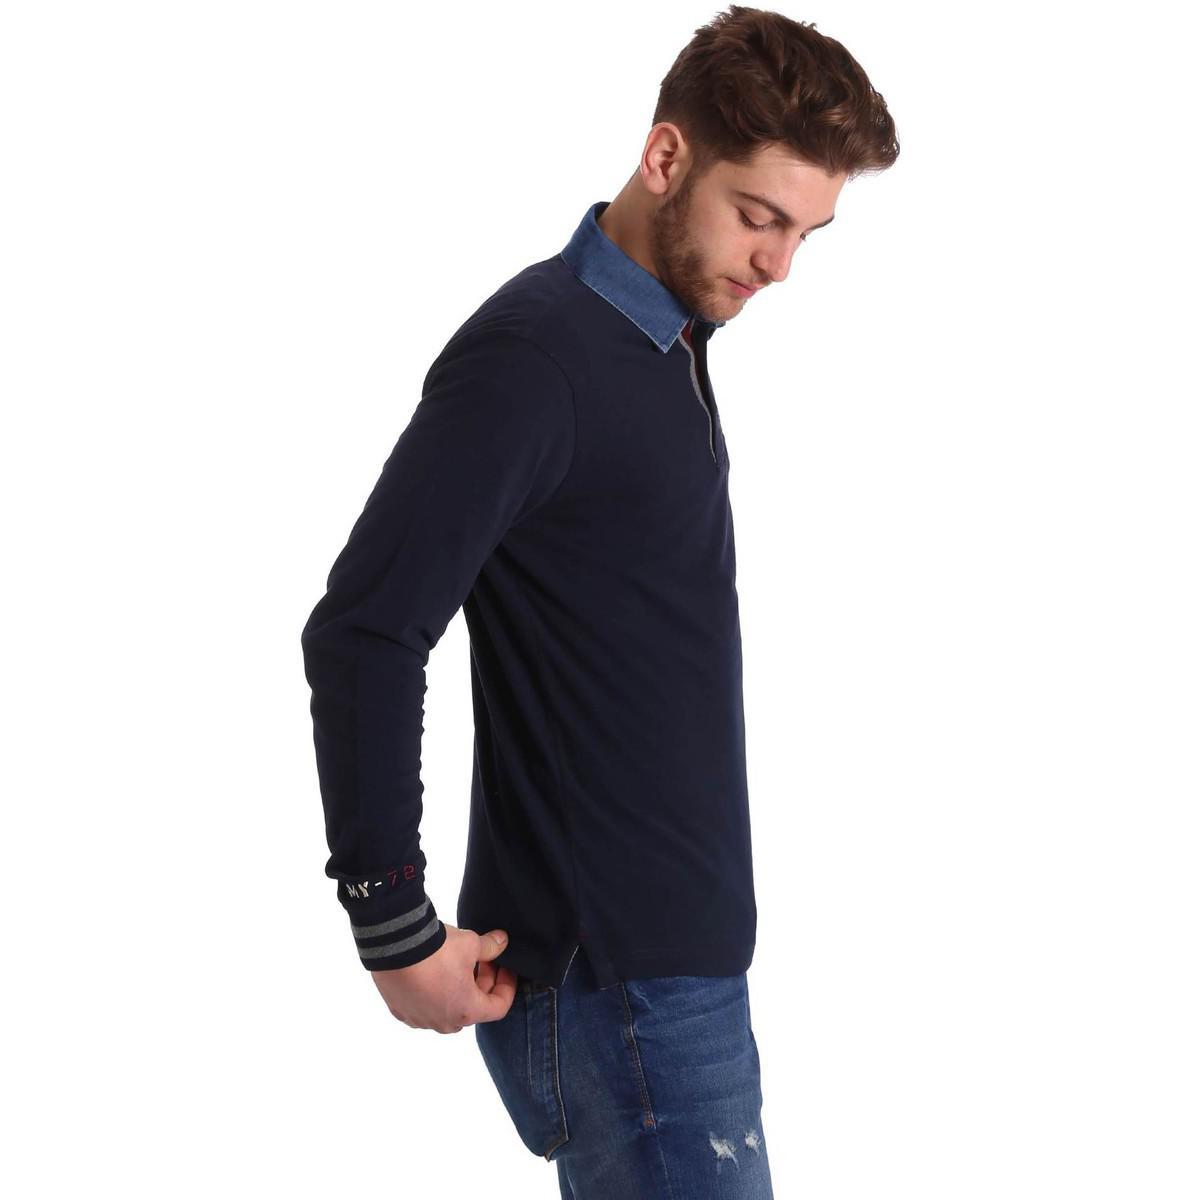 Marina Yachting B20278332750 83235 Polo Man Men's Polo Shirt In Blue for Men